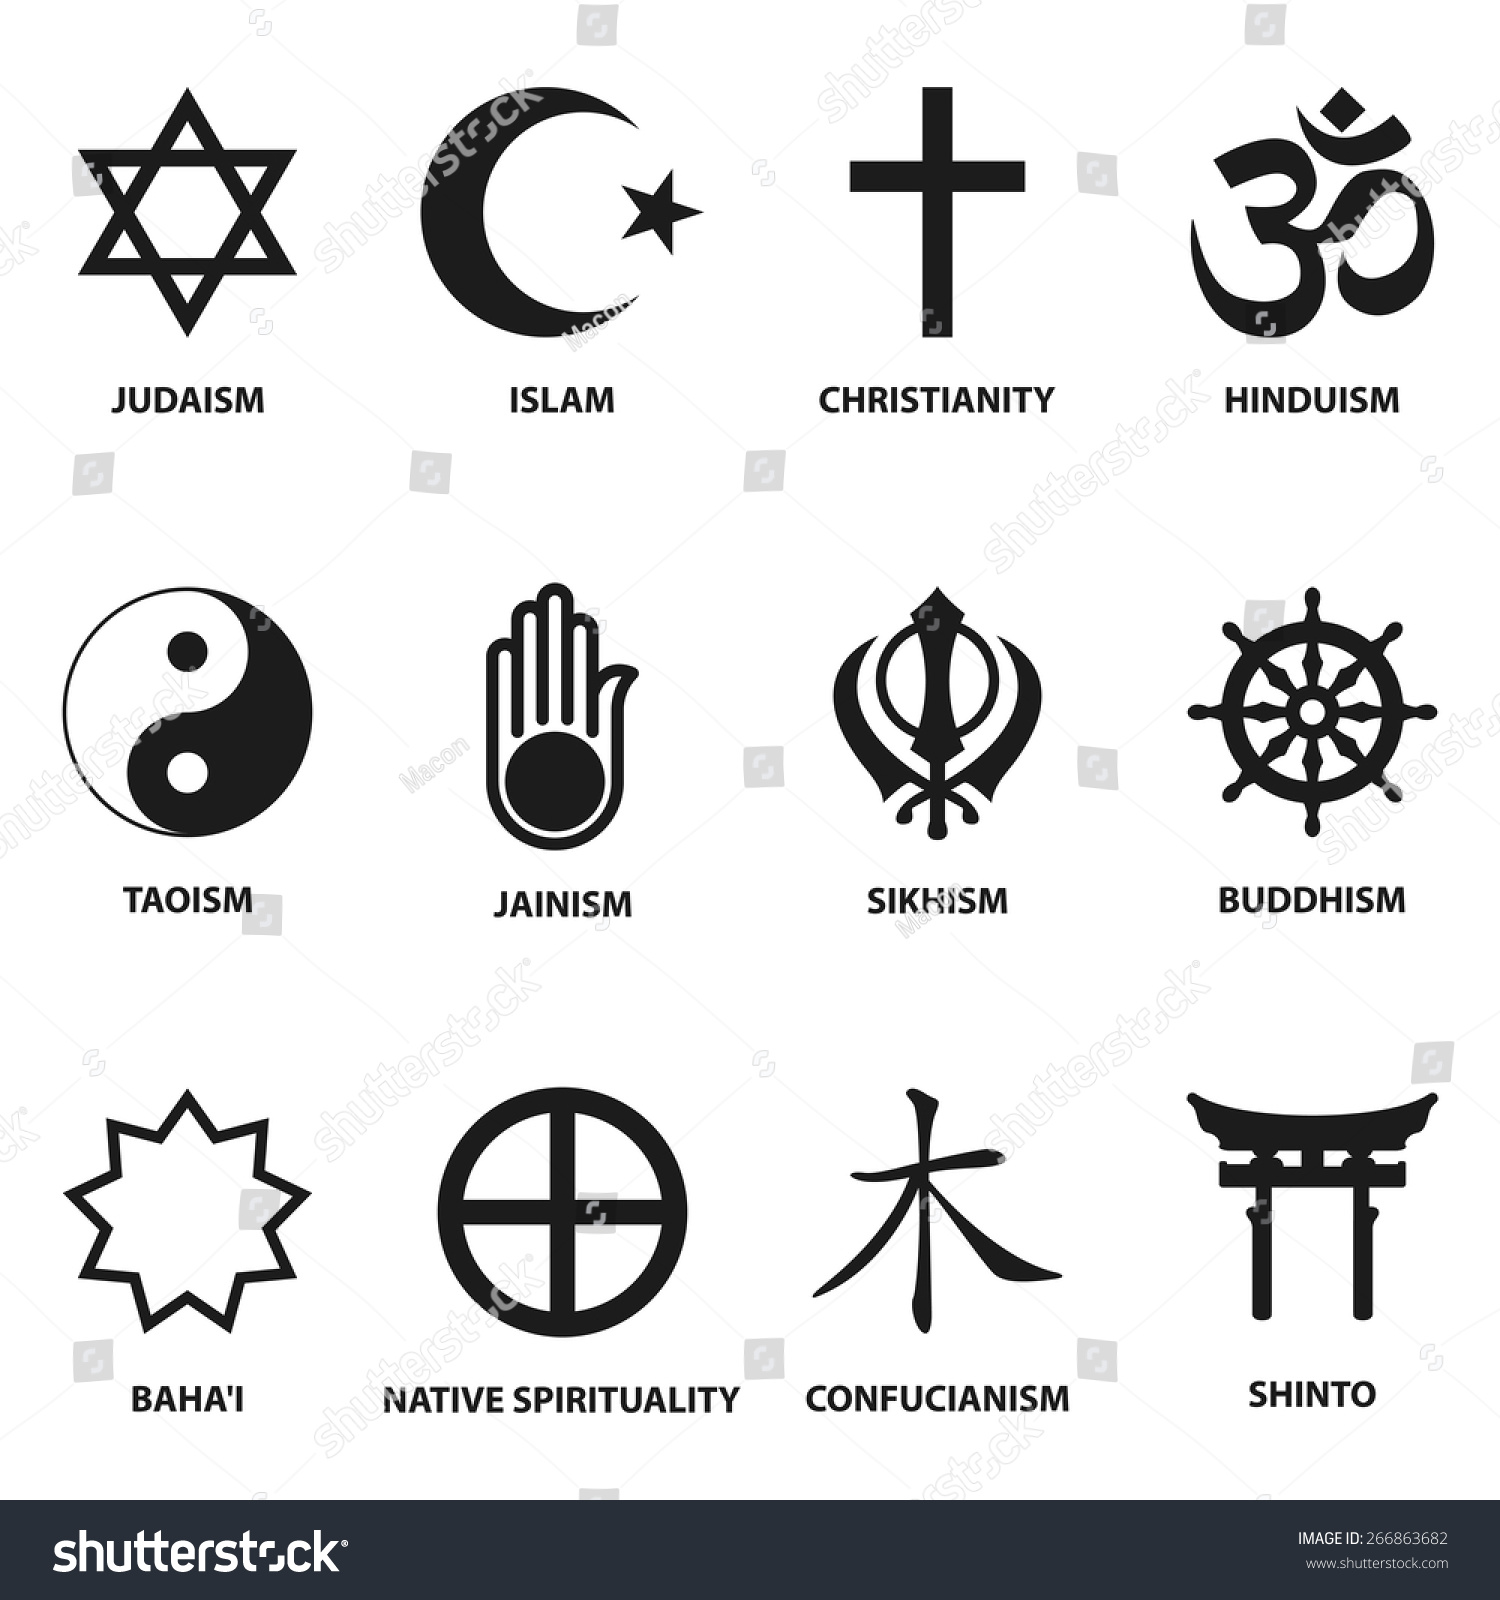 Caucasian christian world vs oriental muslim world 2